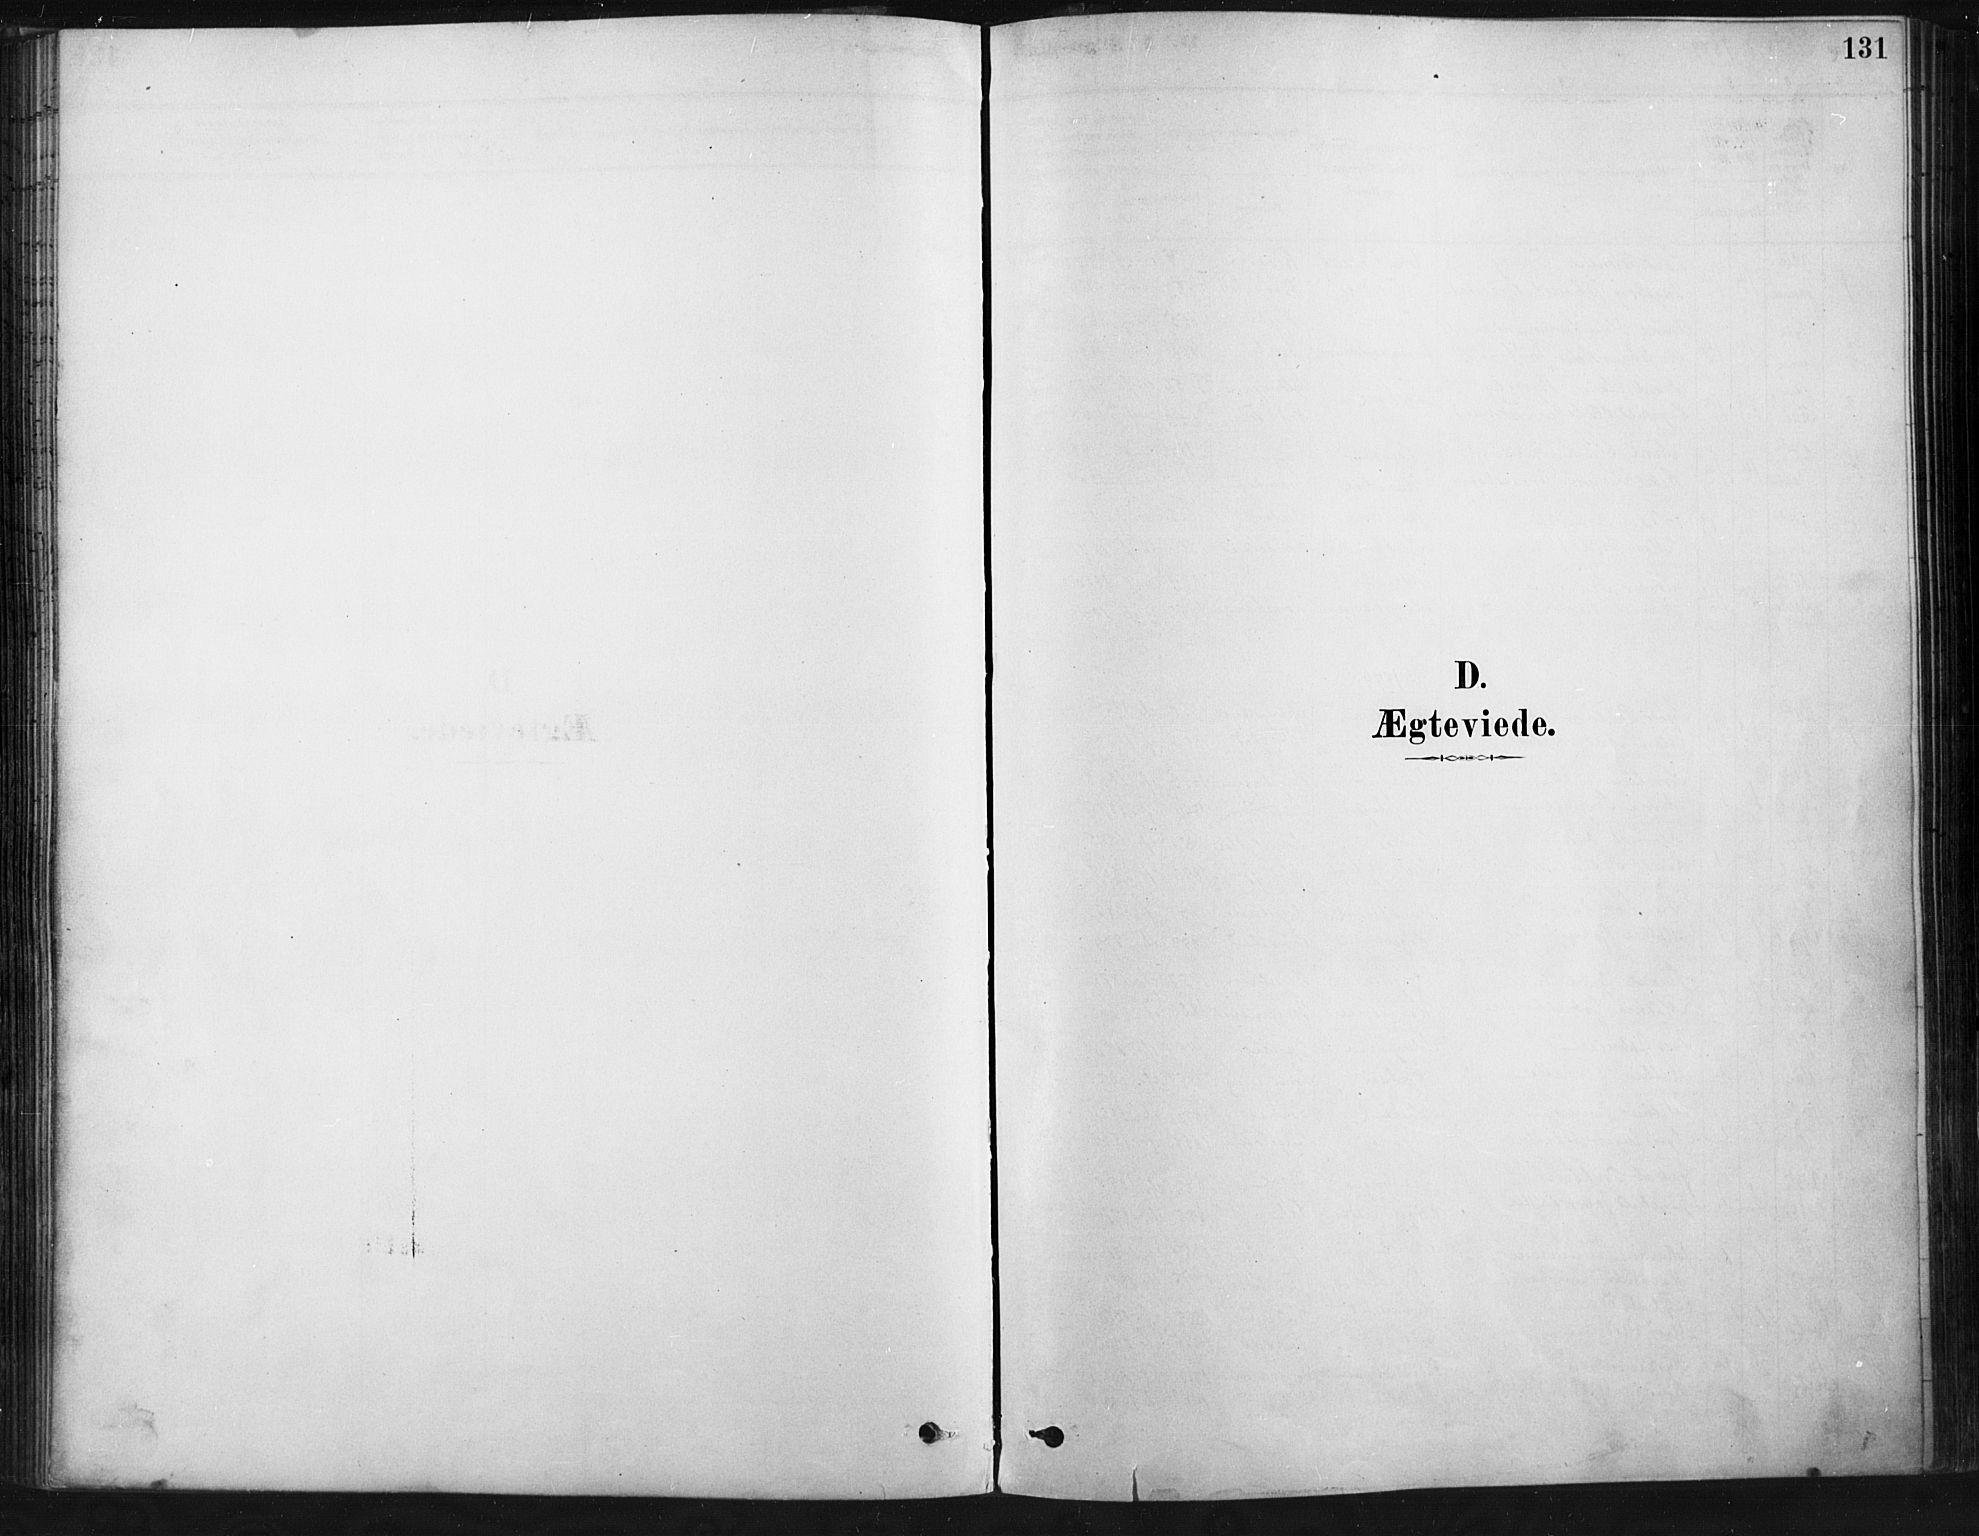 SAH, Ringebu prestekontor, Ministerialbok nr. 9, 1878-1898, s. 131